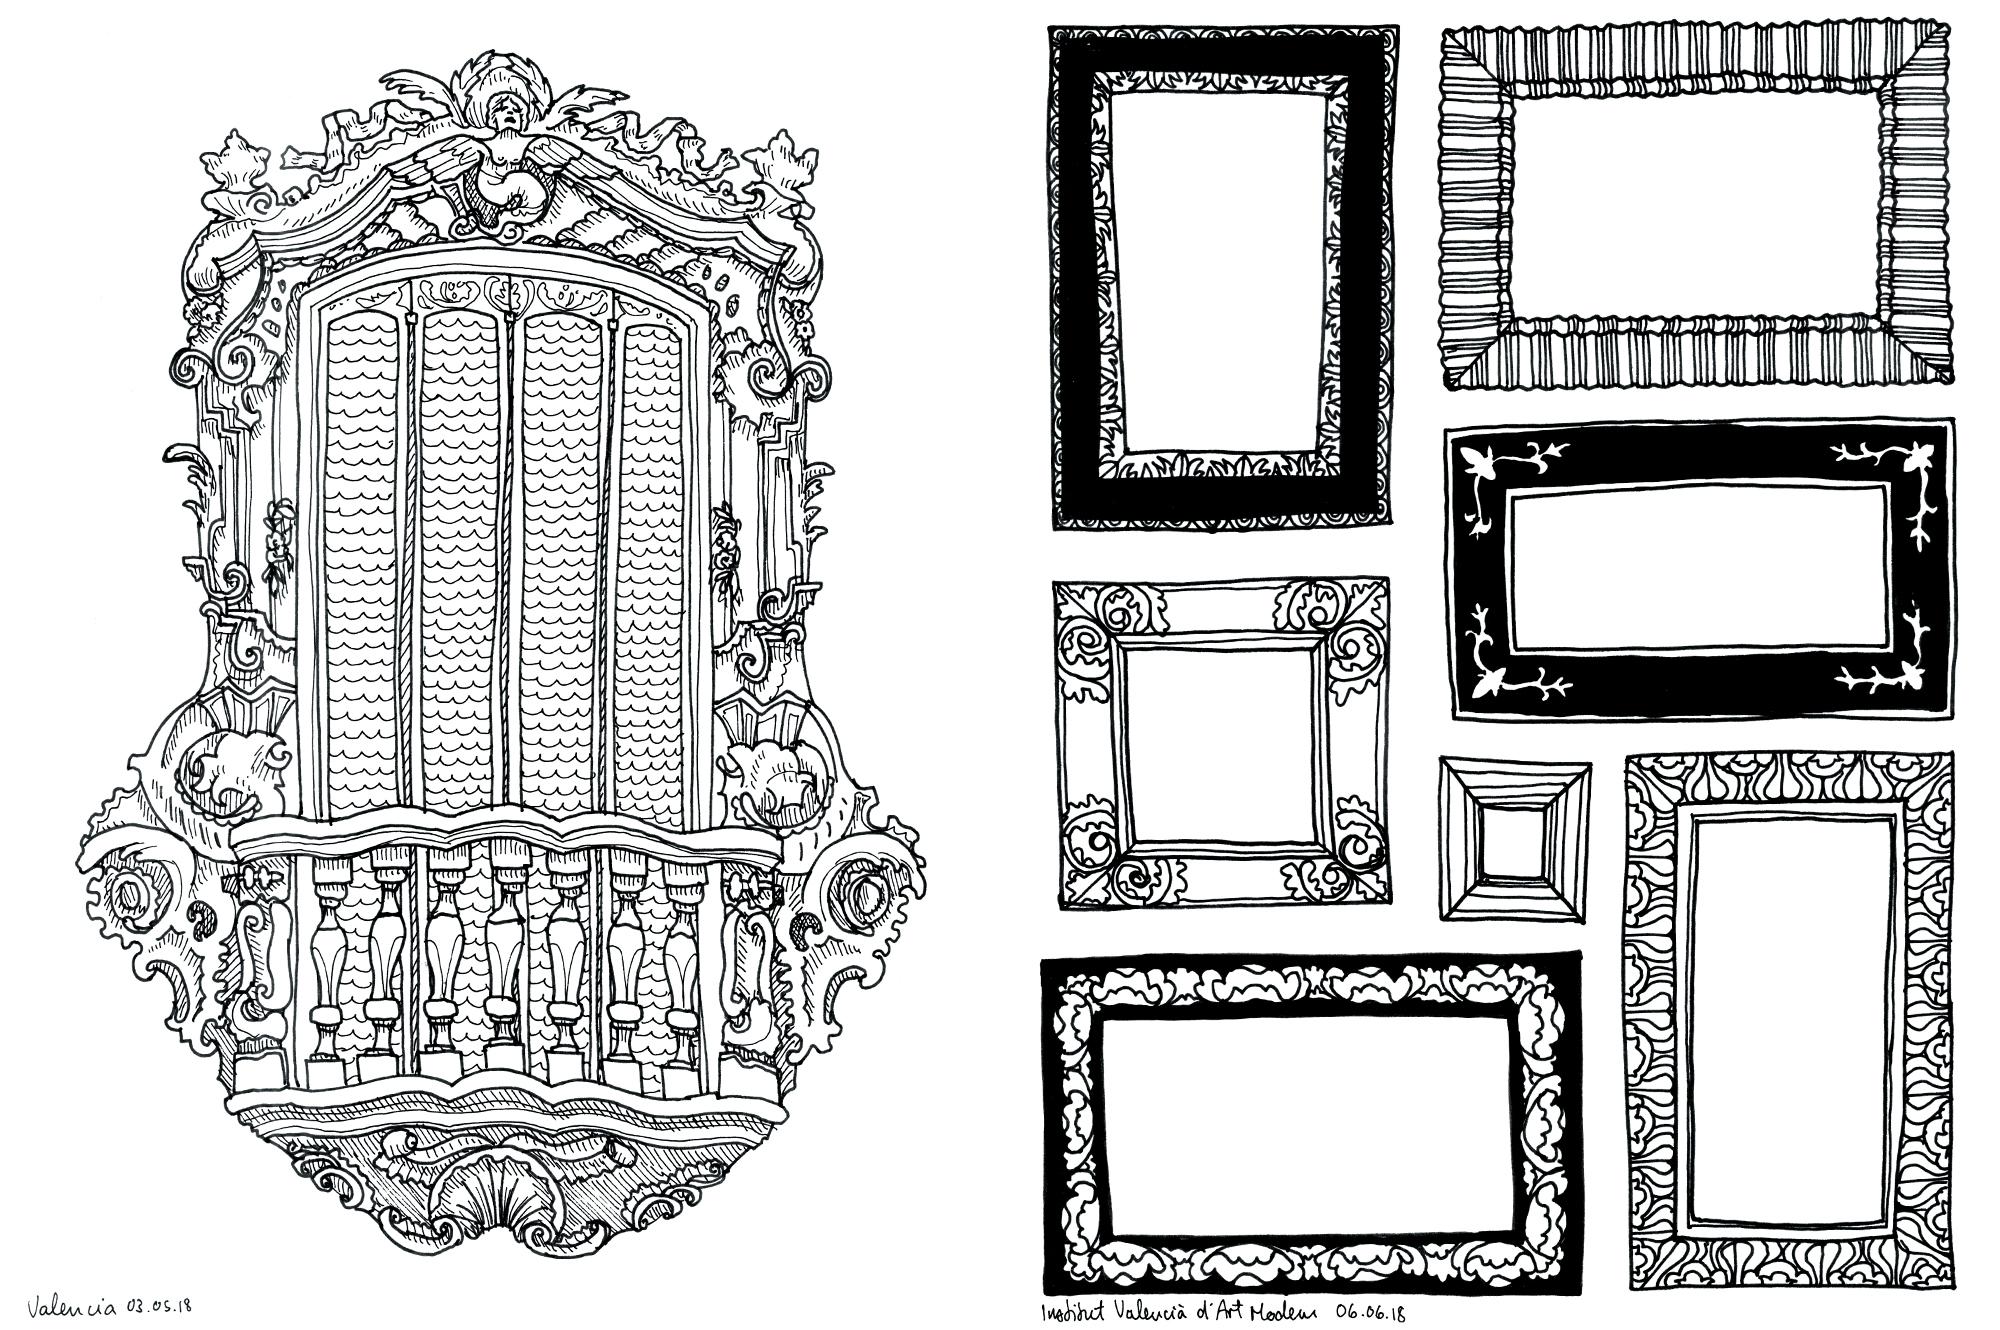 33_valencia_window_artframes_web.jpg